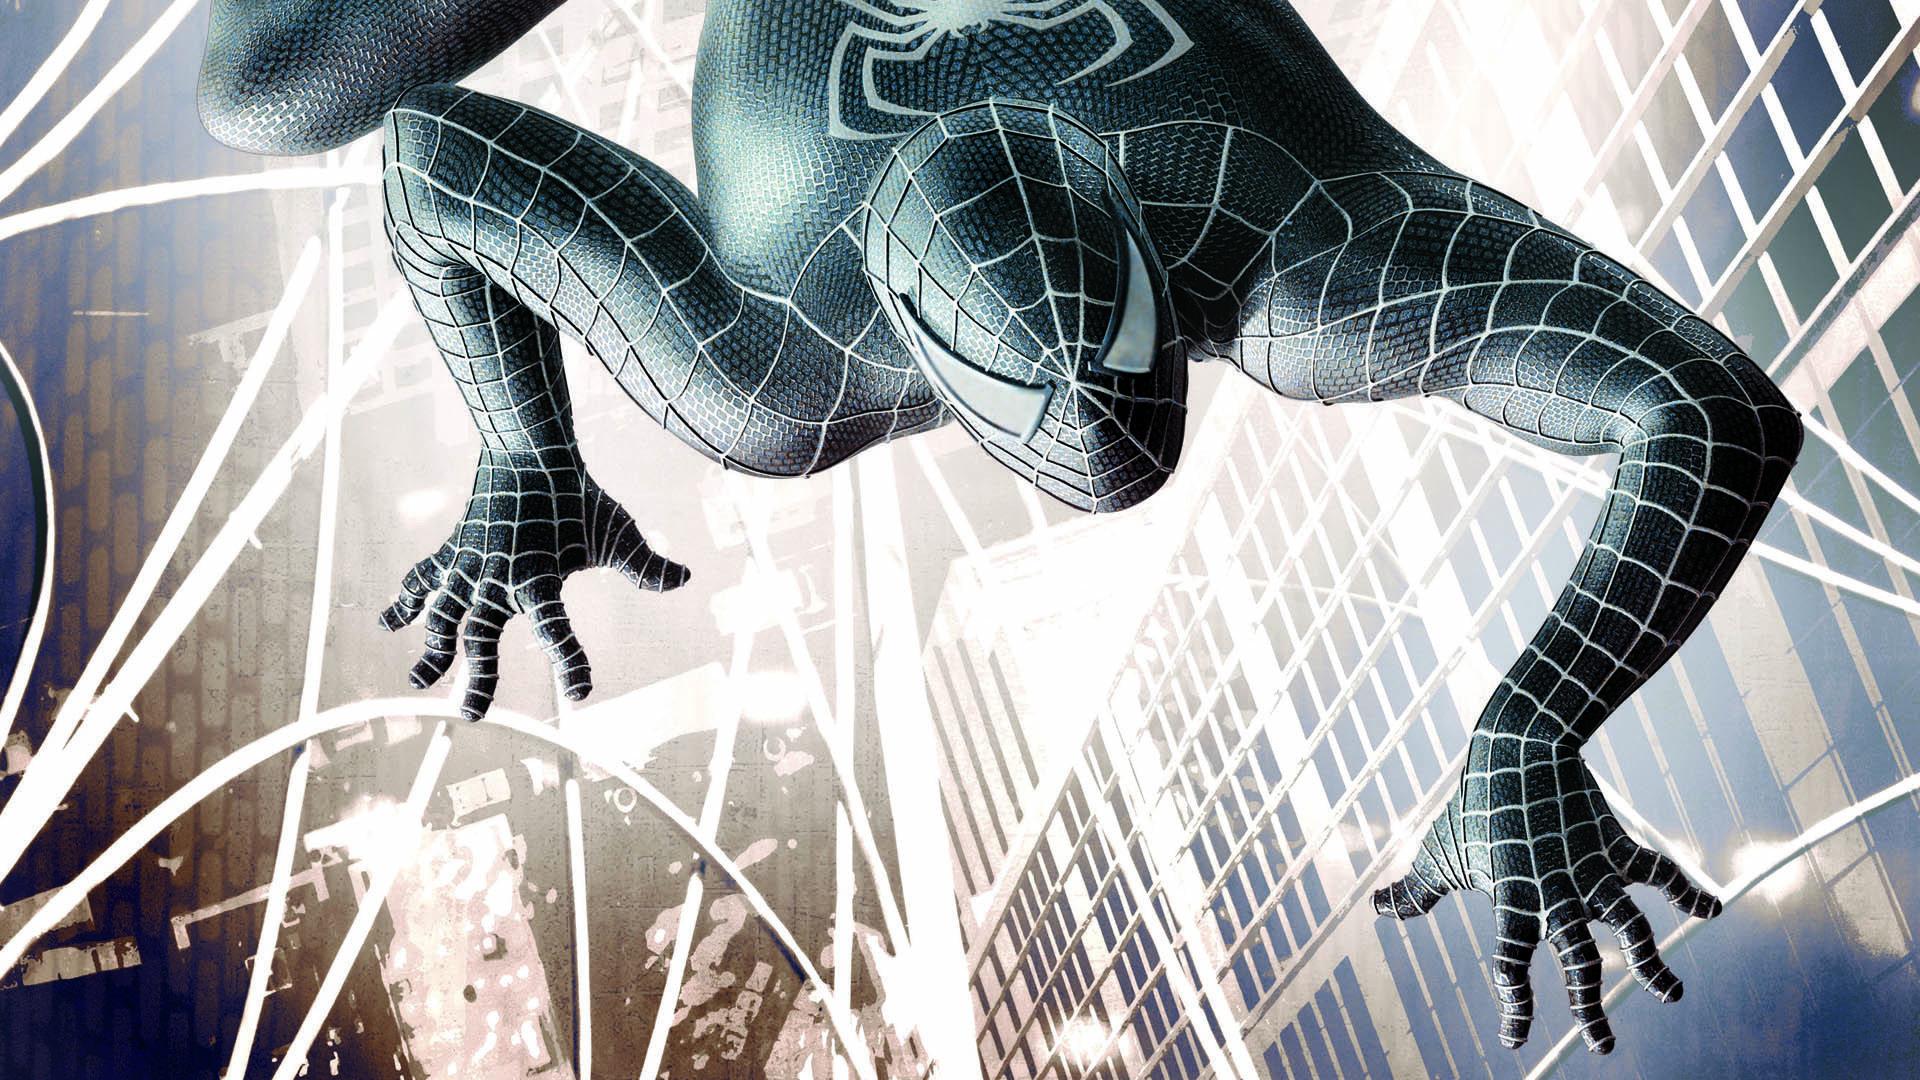 Spider man 3 wallpapers 1920x1080 full hd 1080p desktop - Spider man 3 wallpaper 1080p ...